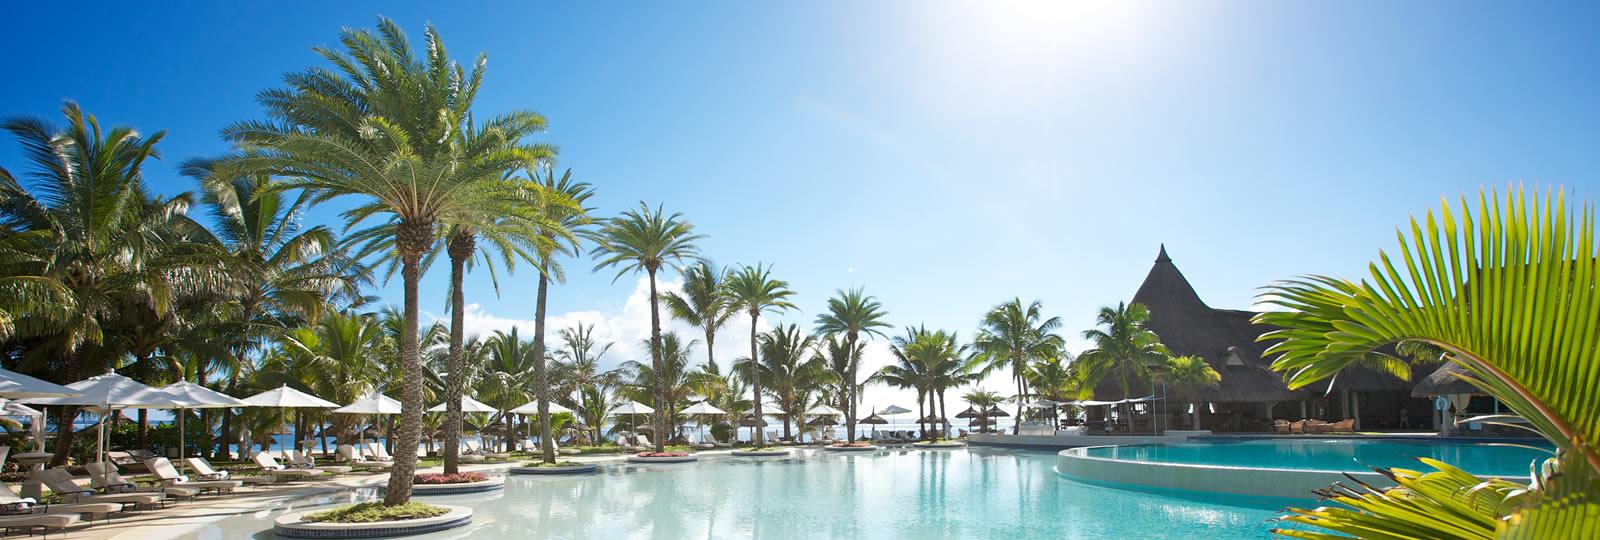 Hotel Piscine Cote D Azur